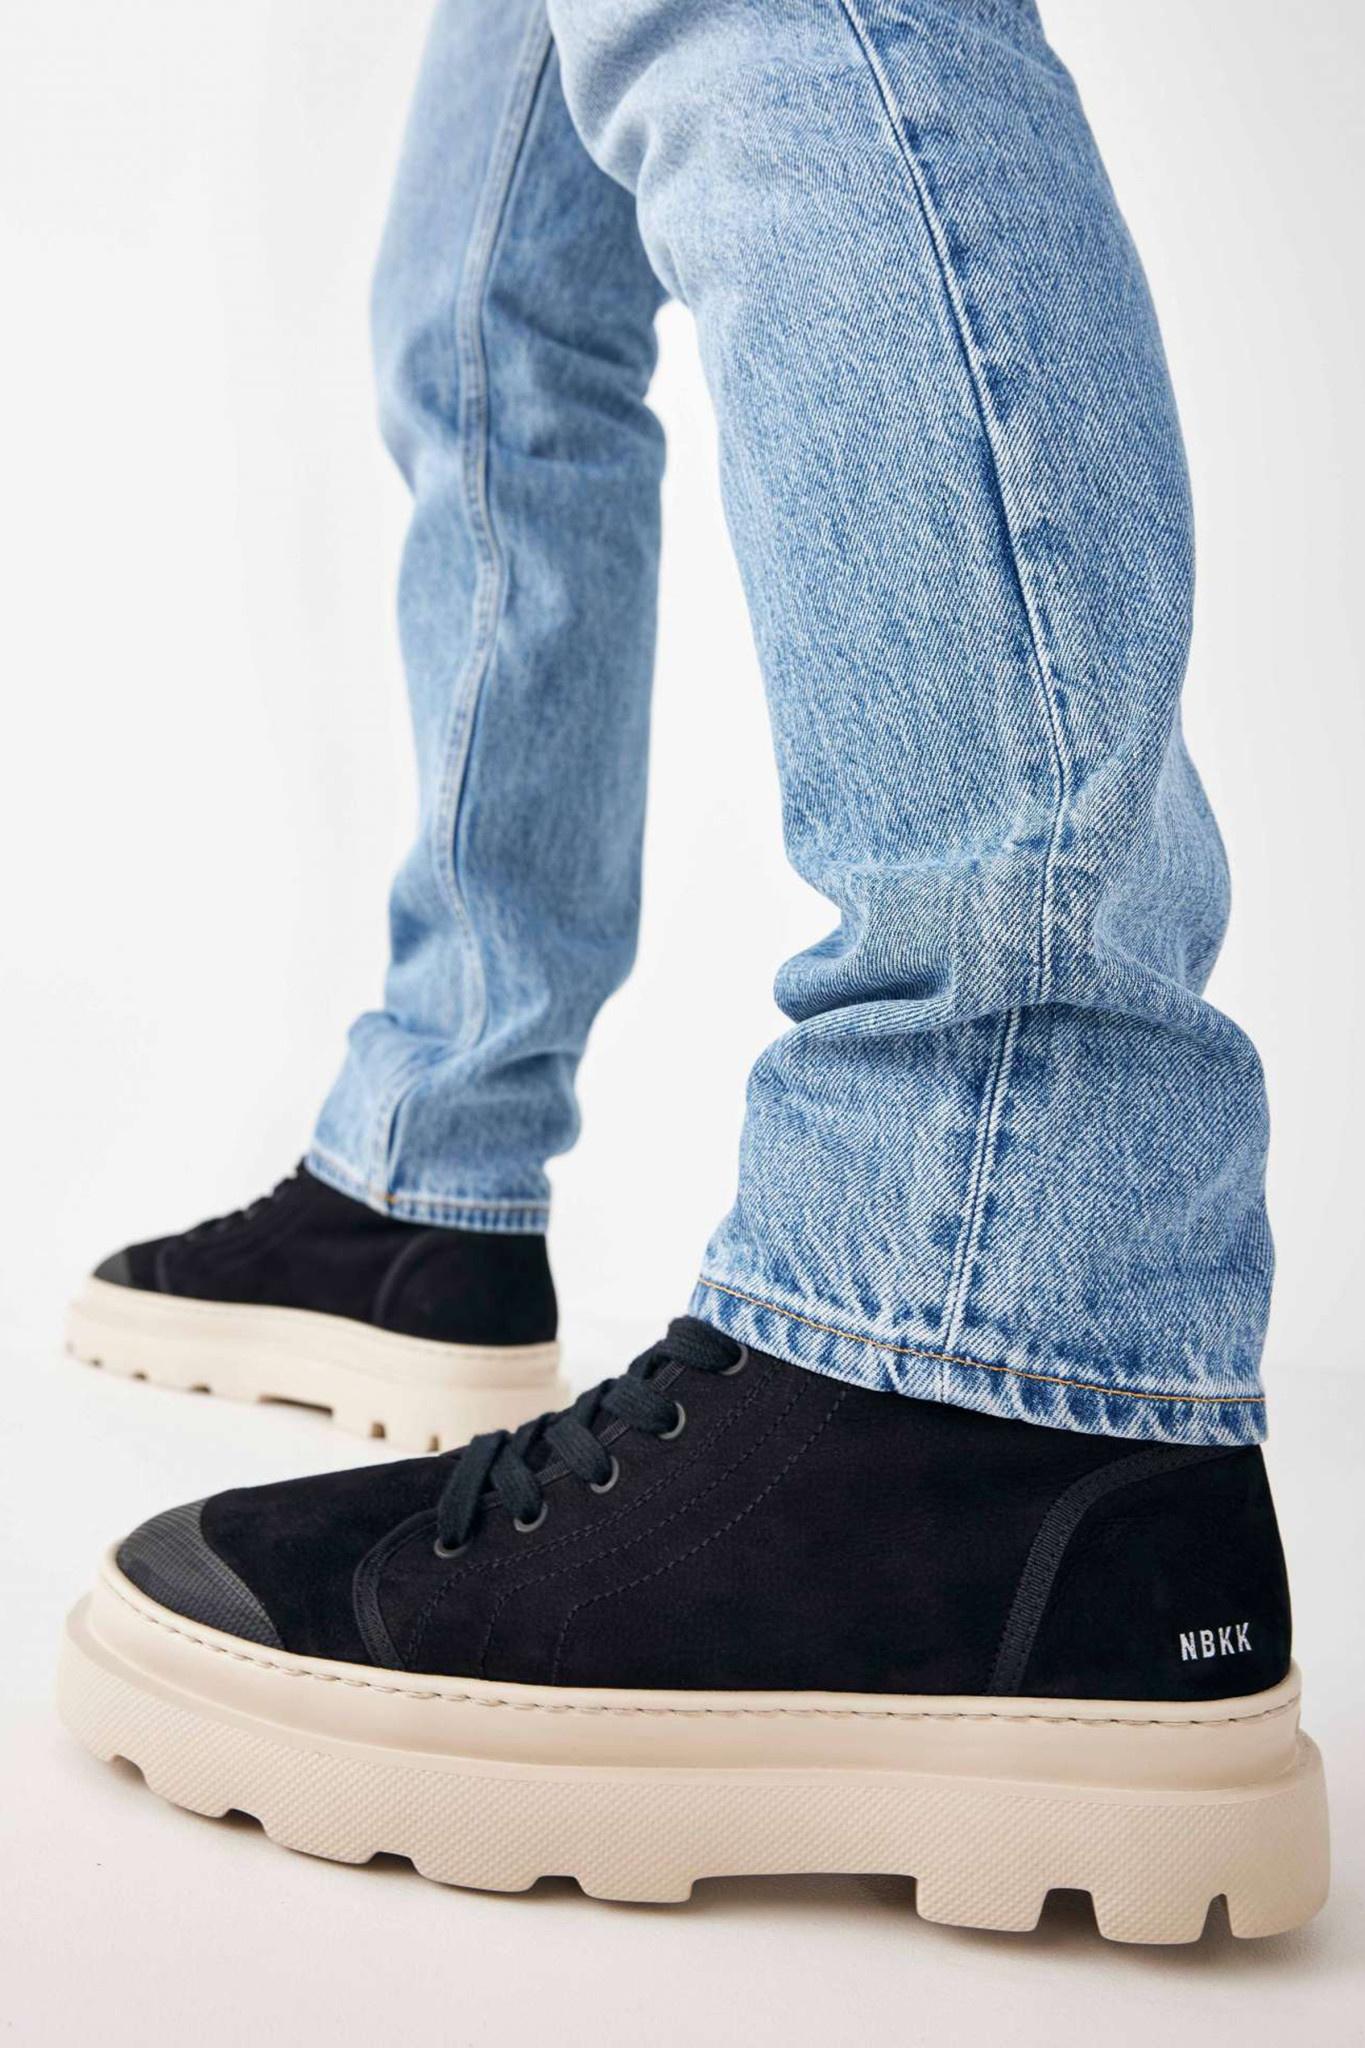 Monro Cyrus Sneaker Boots - Black-2